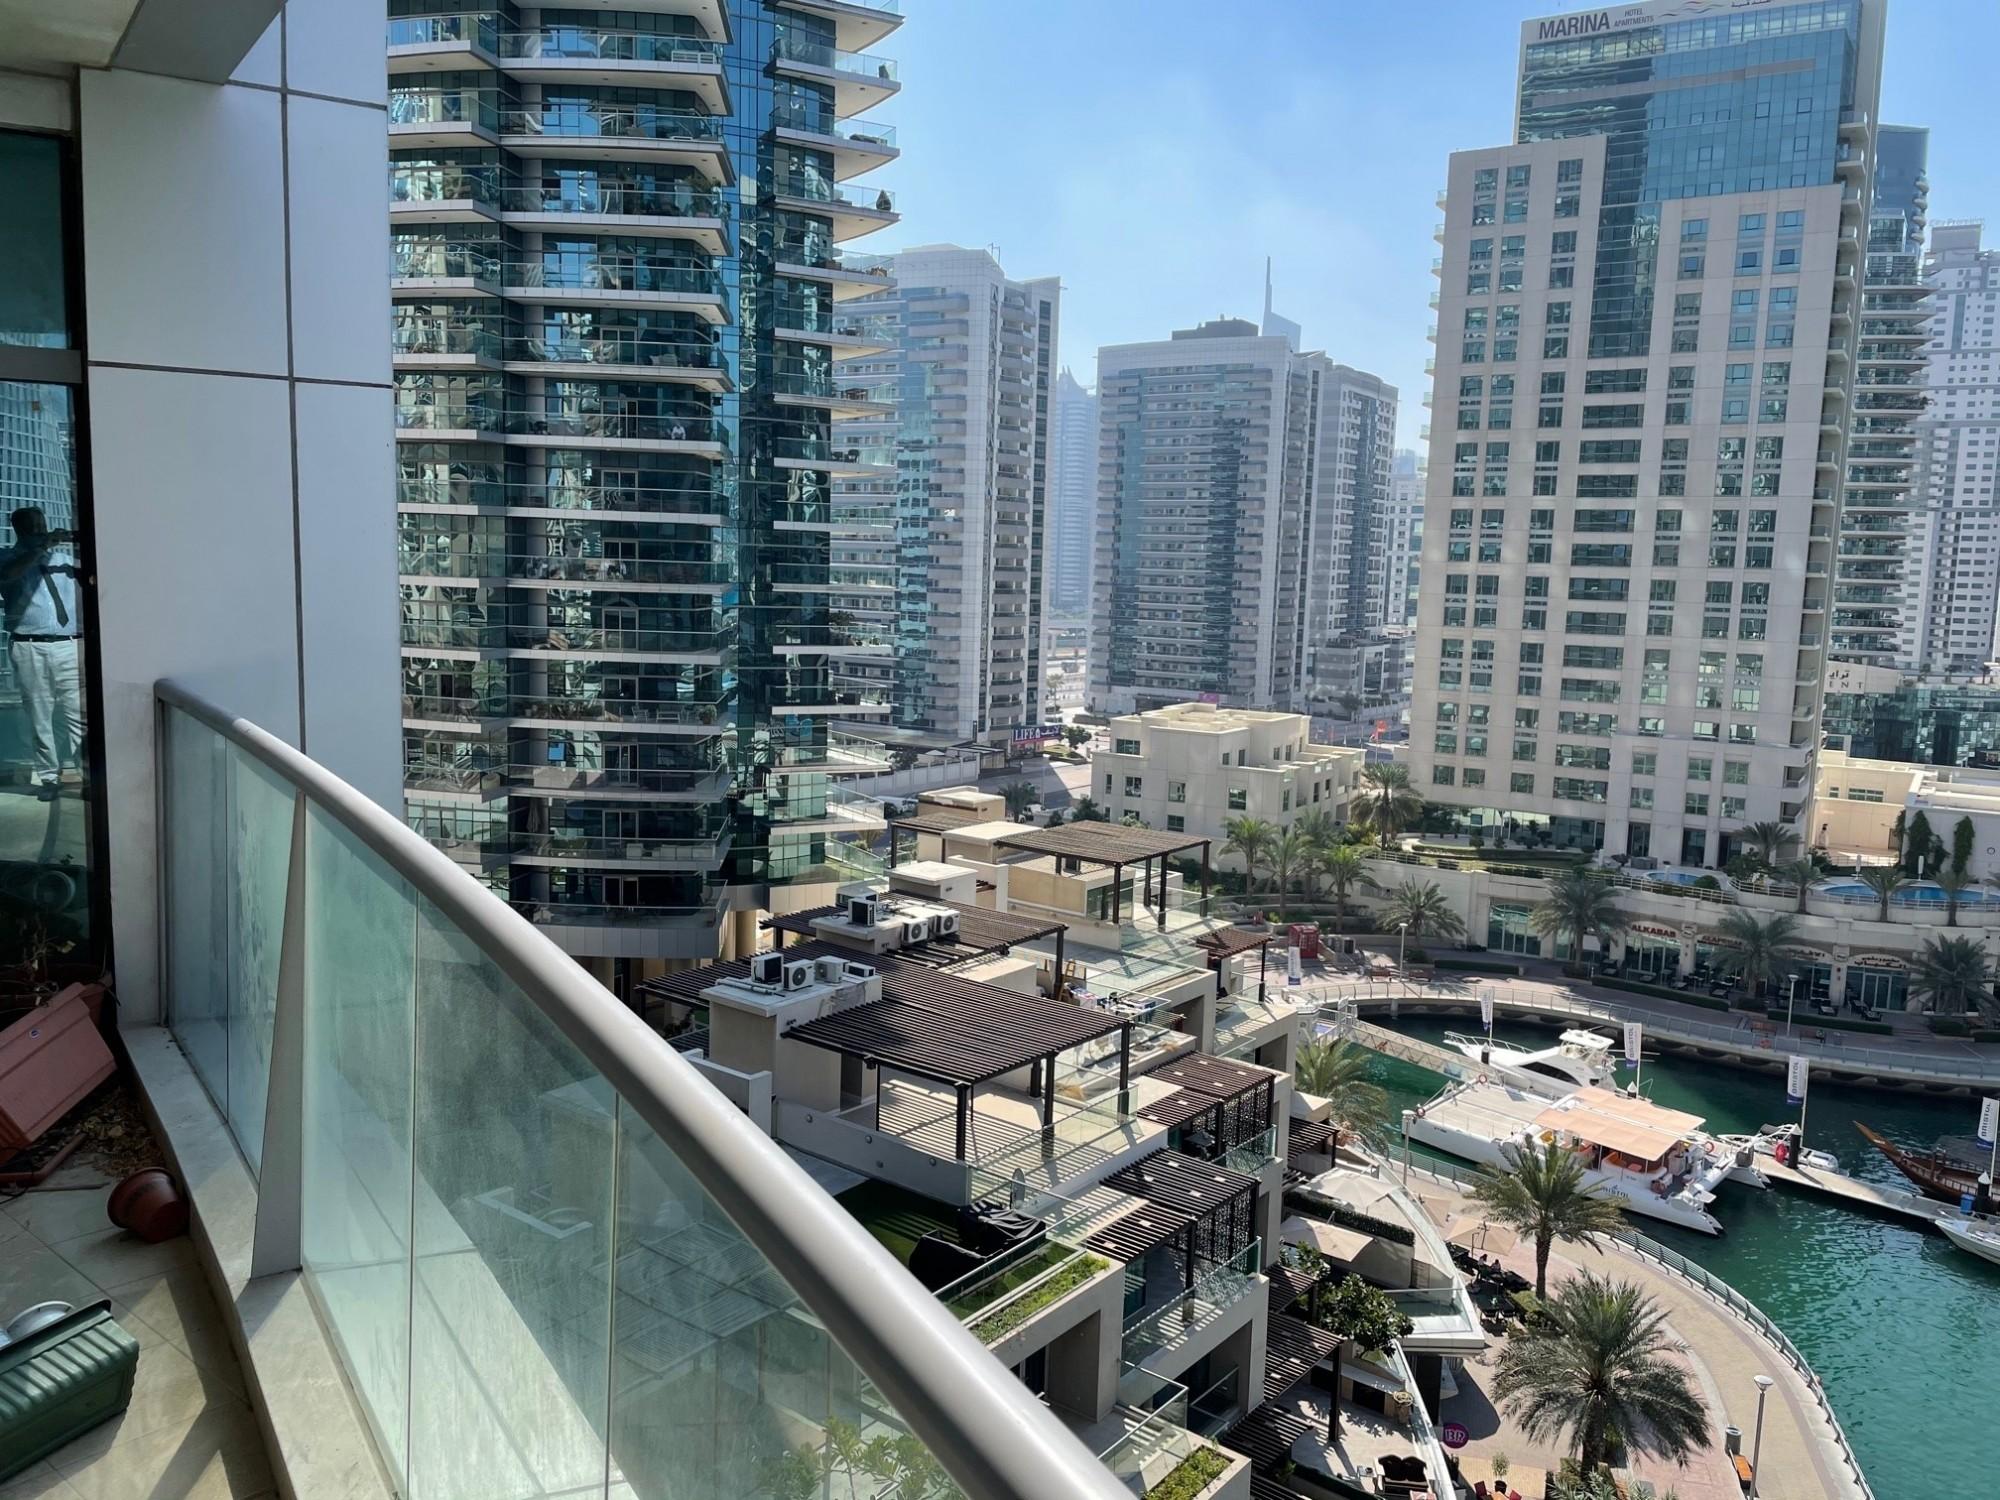 3 B/R Apartment with Amazing Full Marina View| Balcony, 2 Parking, Equipped Kitchen, Maid's& Storage Room | Dubai Marina